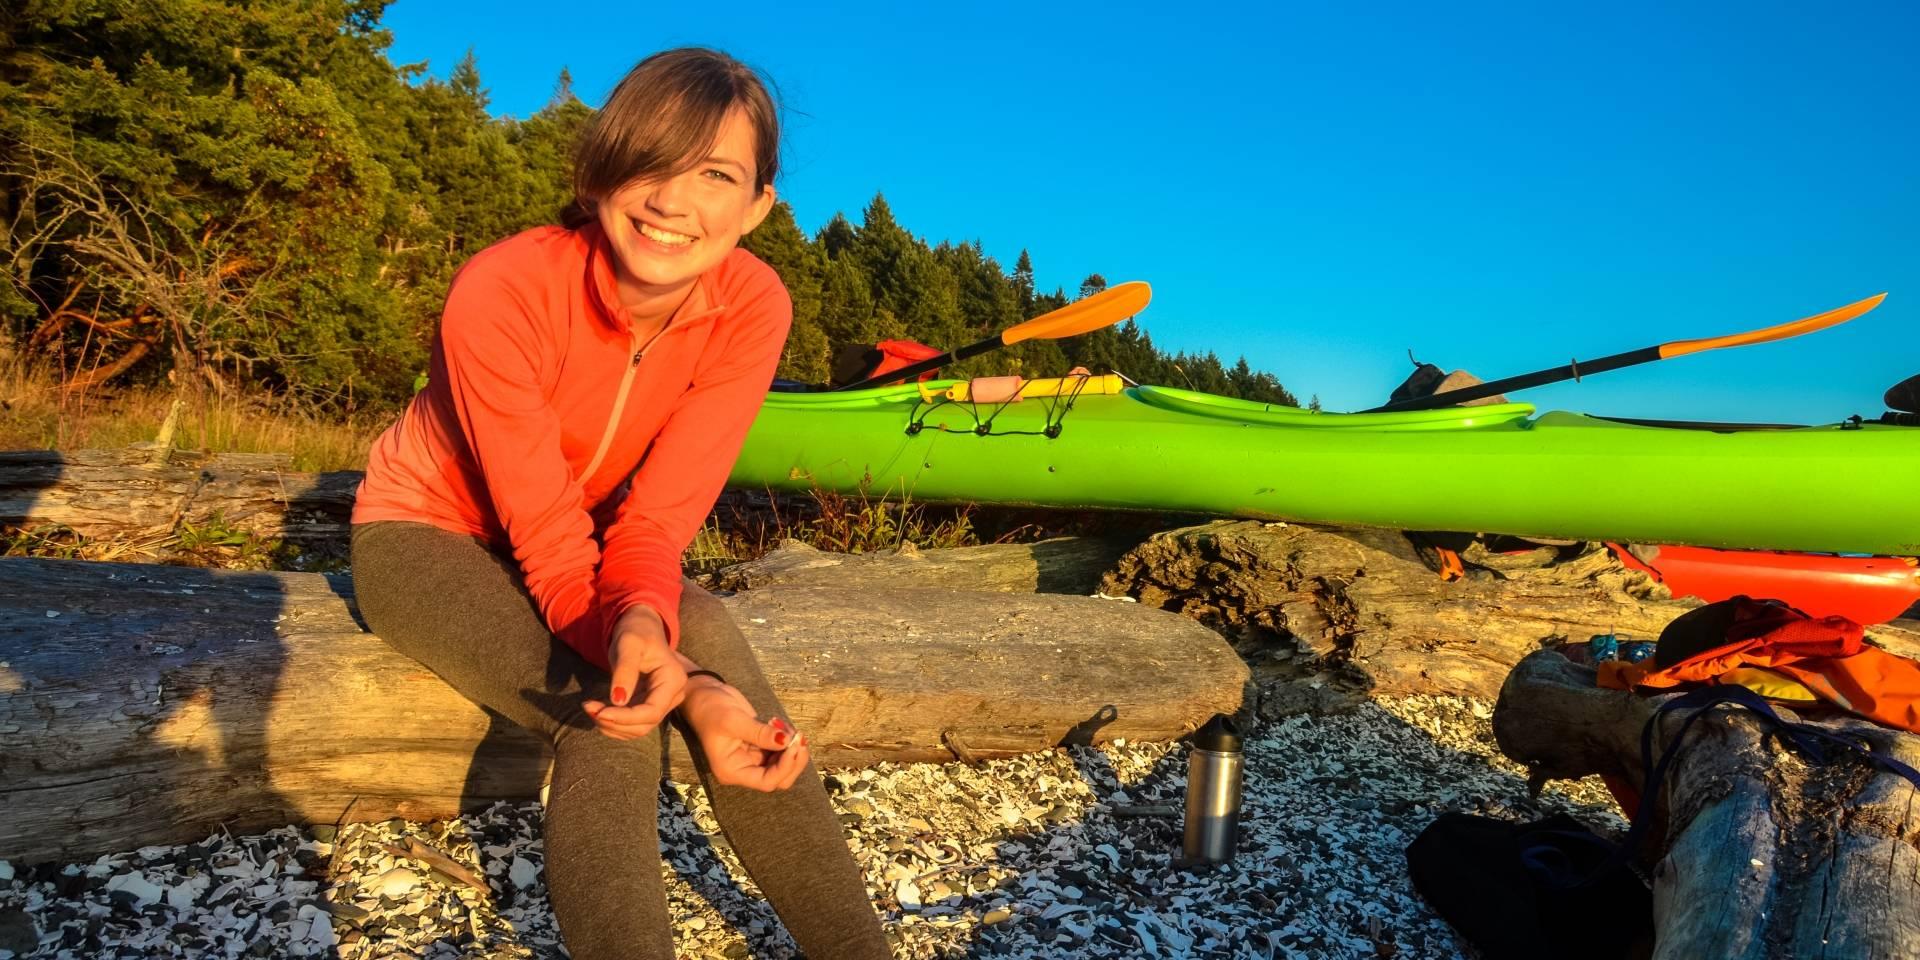 Victoria Kayak Tours & Rentals